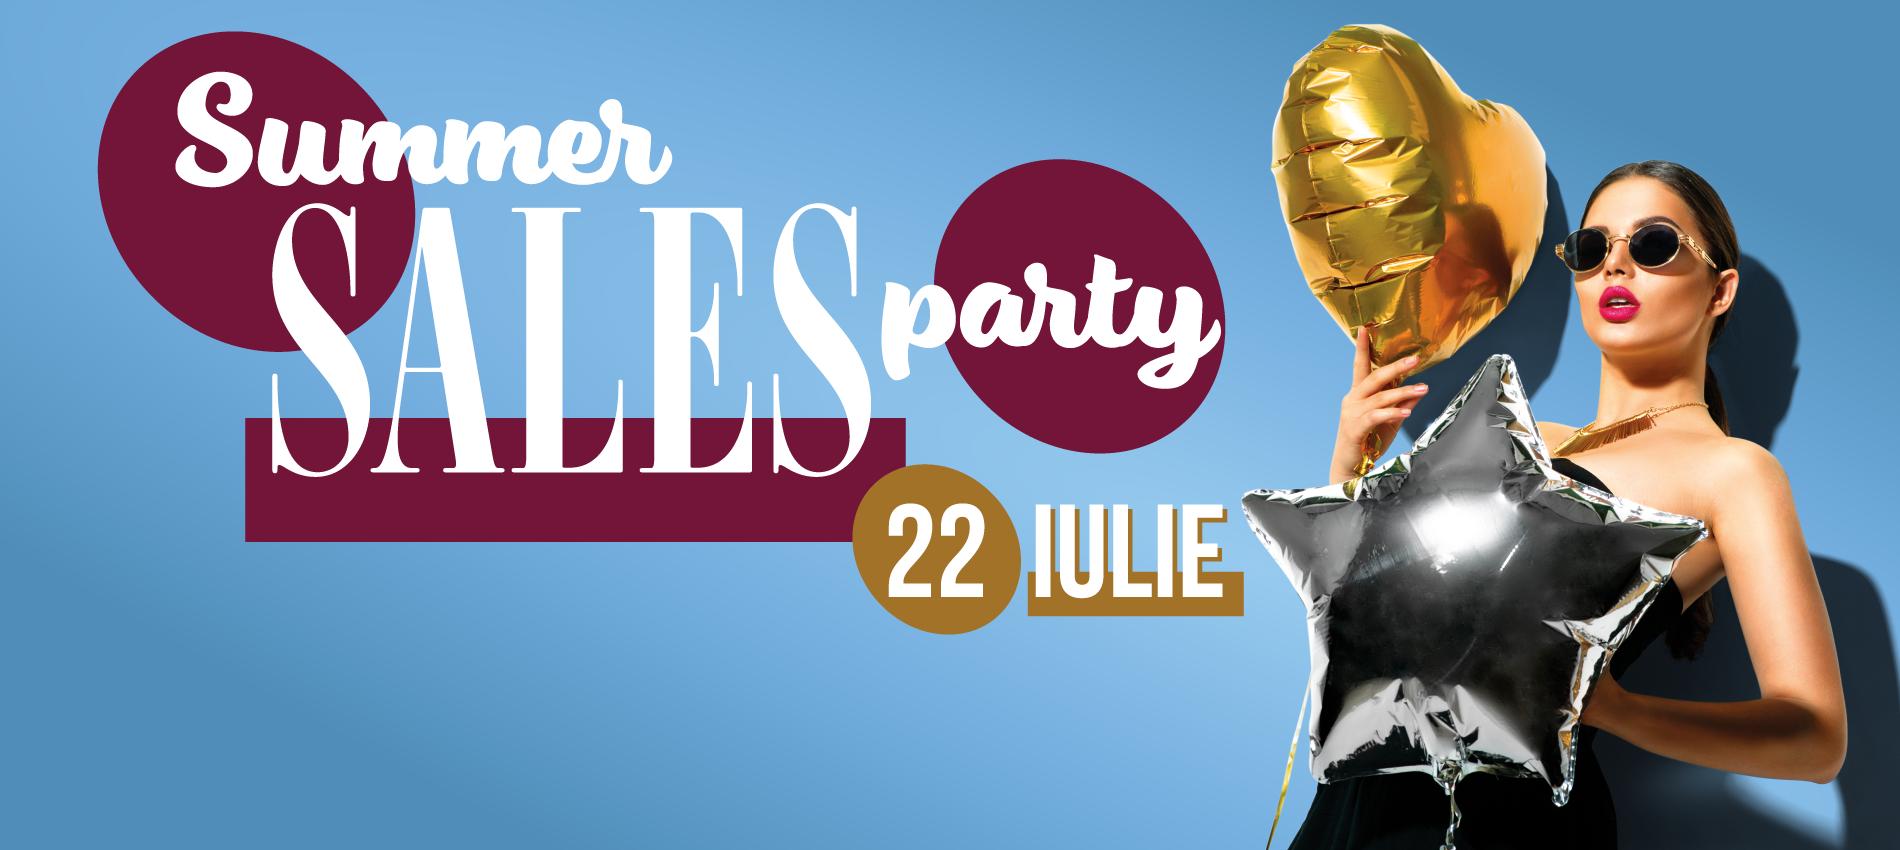 SB_Summer-Sales-Party_slider-principal